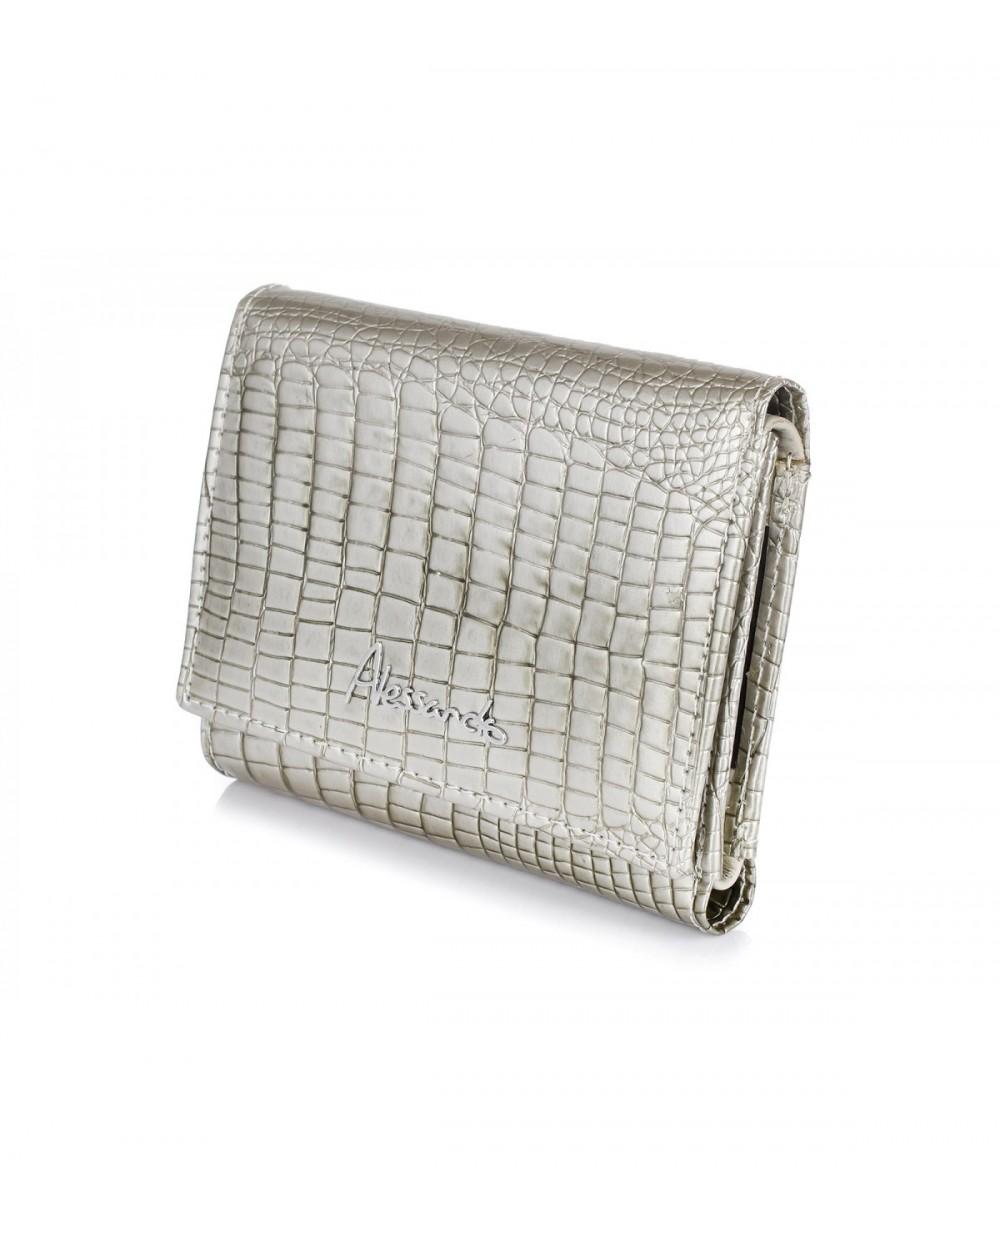 Mały damski portfel skórzany Alessandro Paoli srebrny